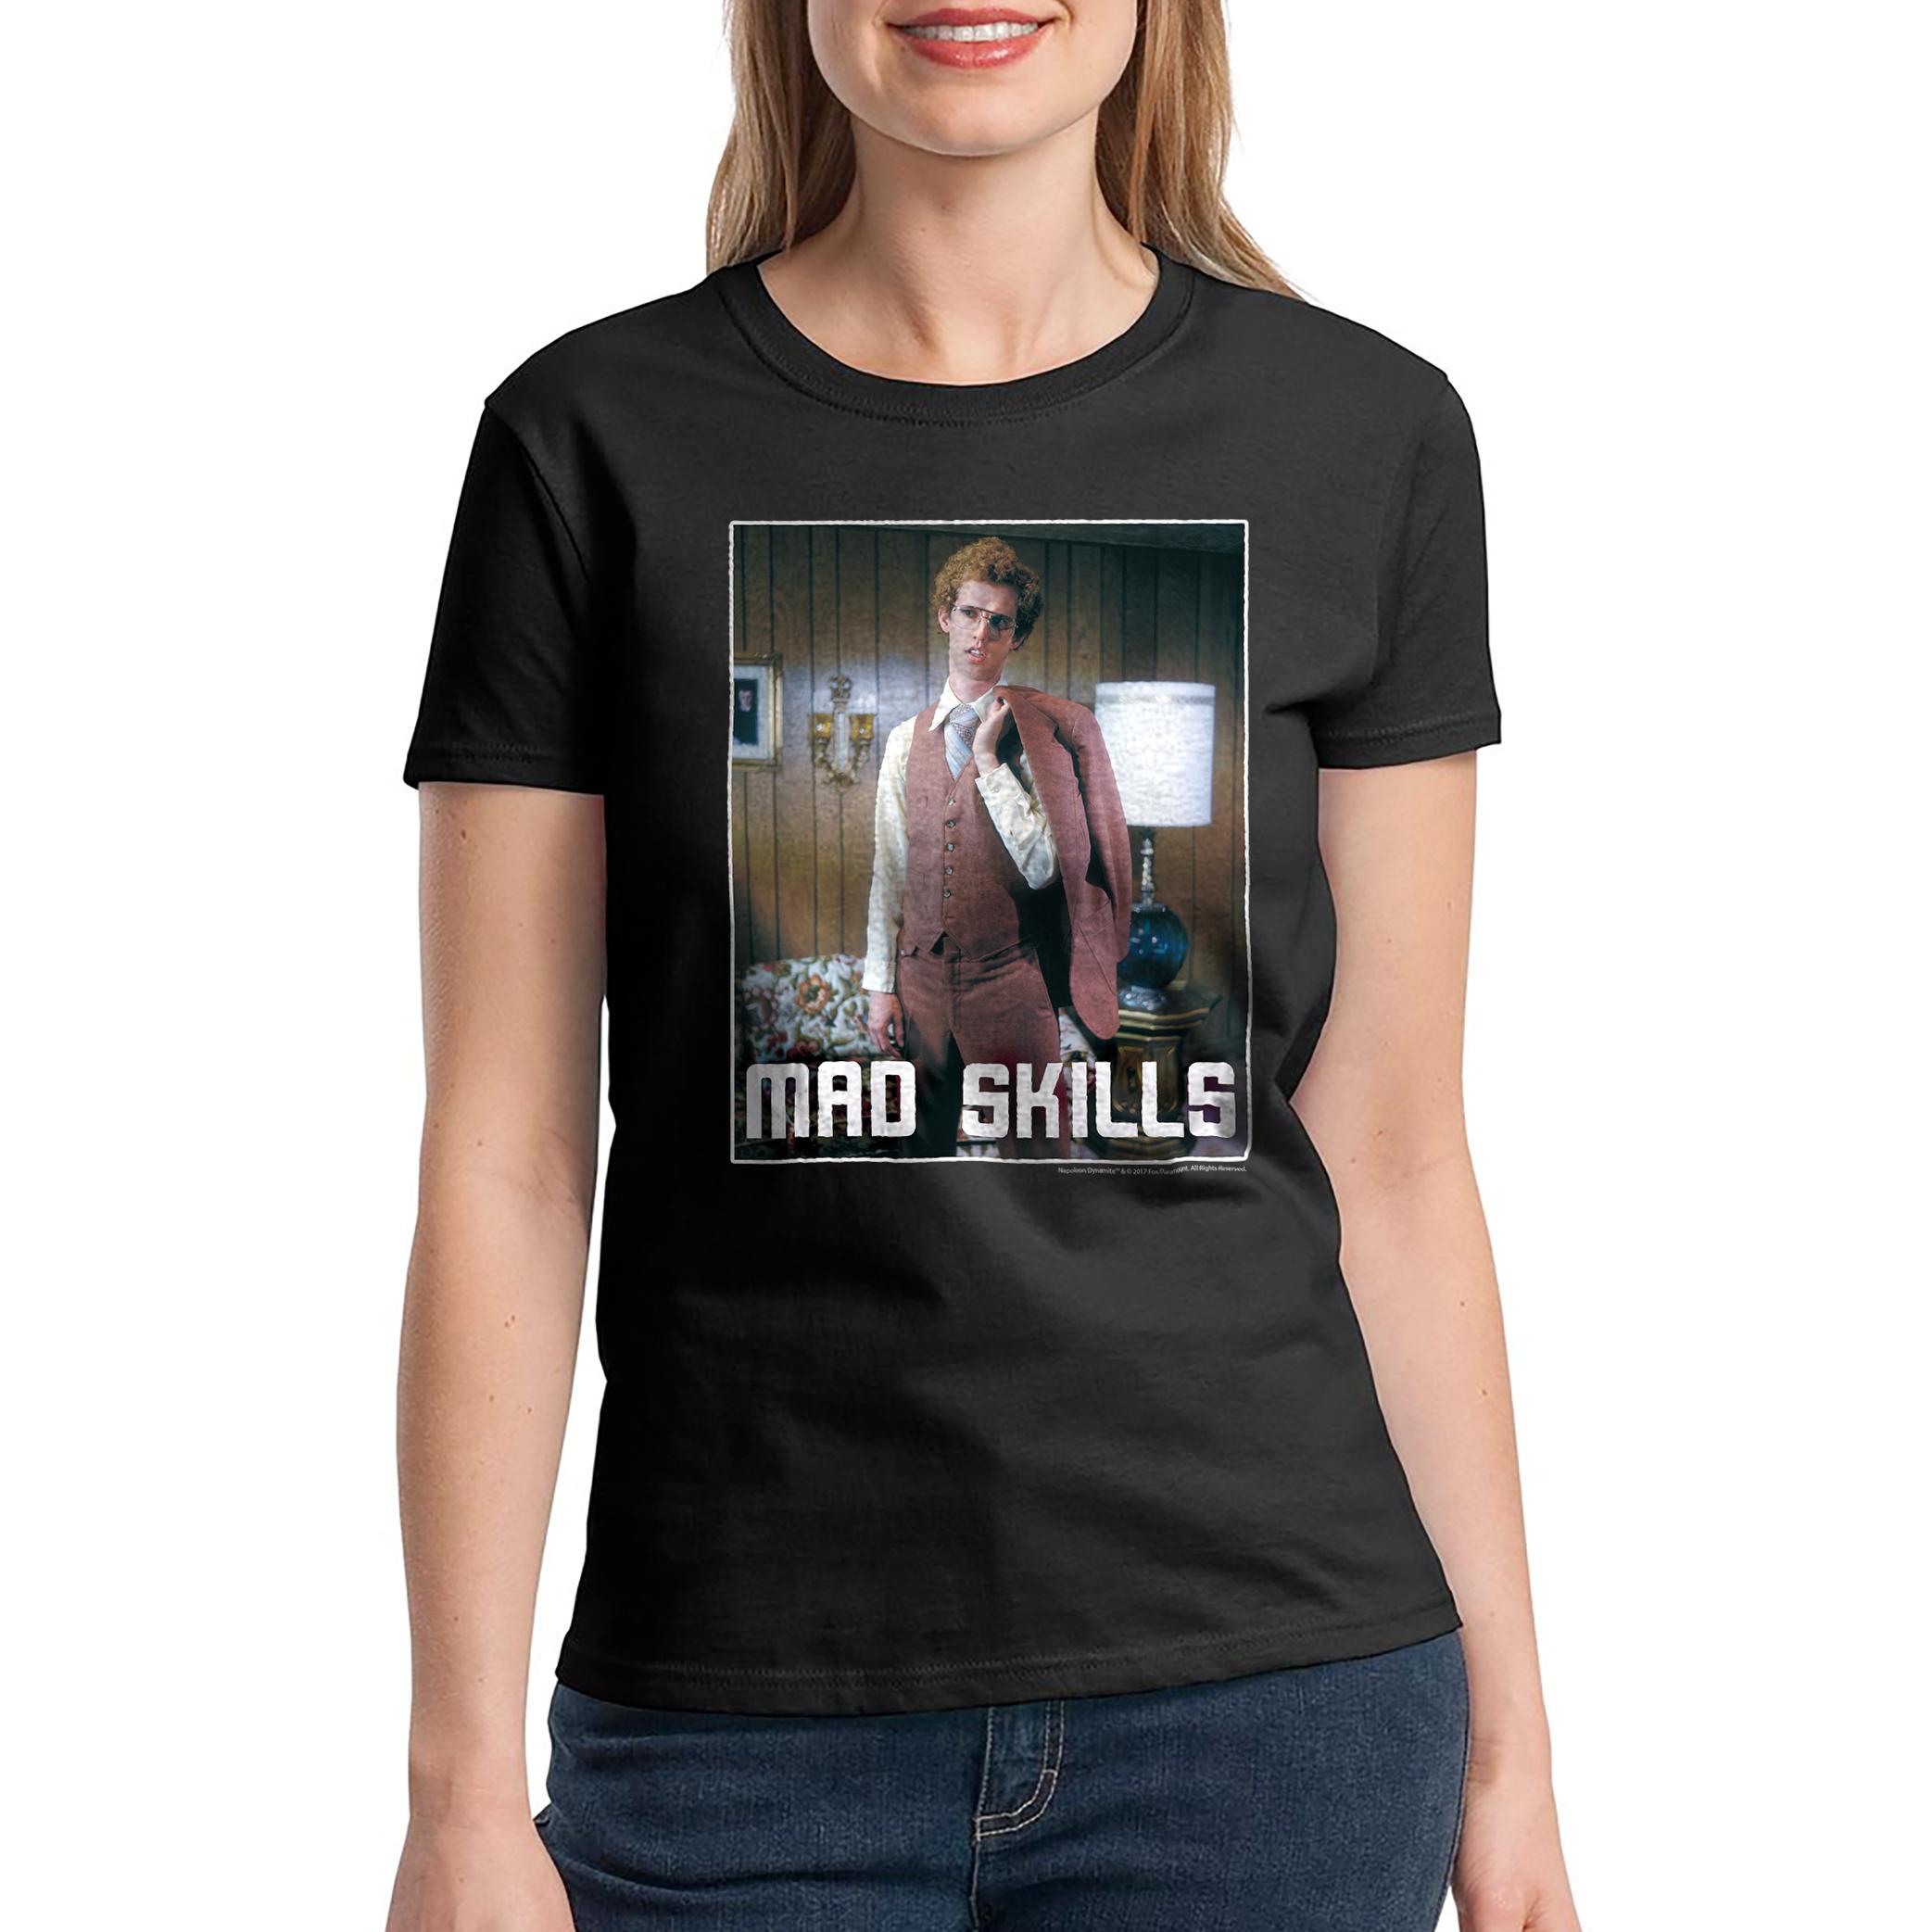 Napoleon Dynamite Mad Skills Suit Women's Black Funny T-shirt NEW Sizes S-2XL